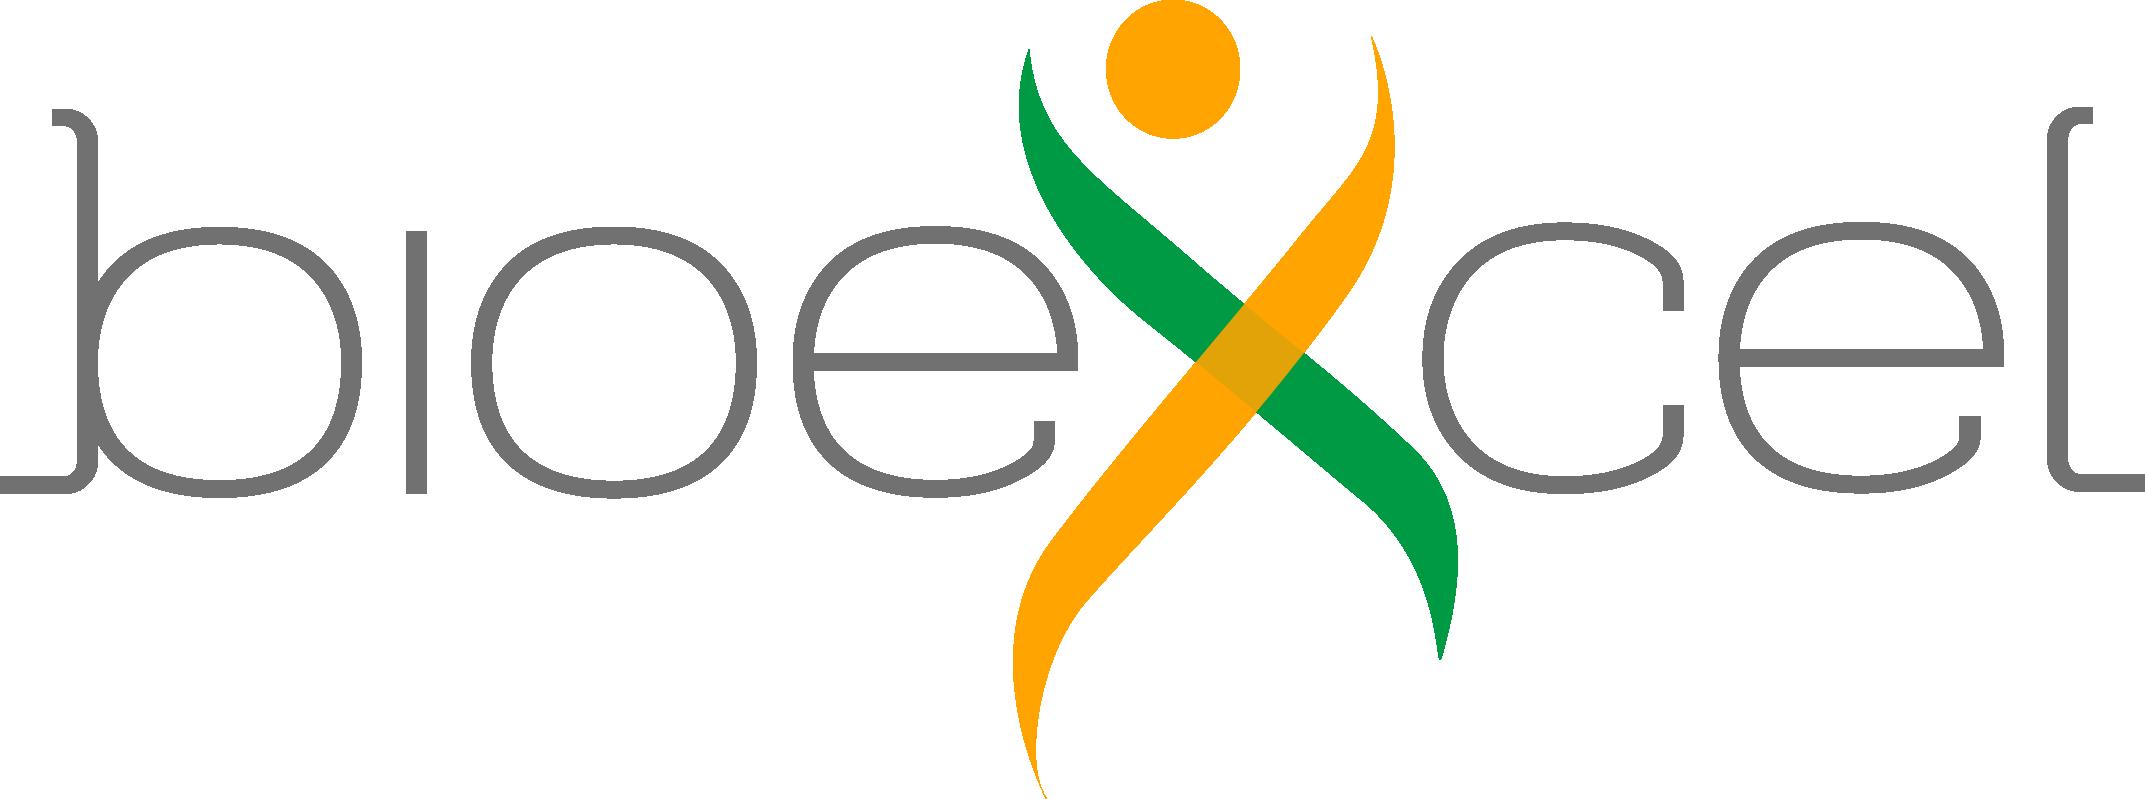 BioExcel logo